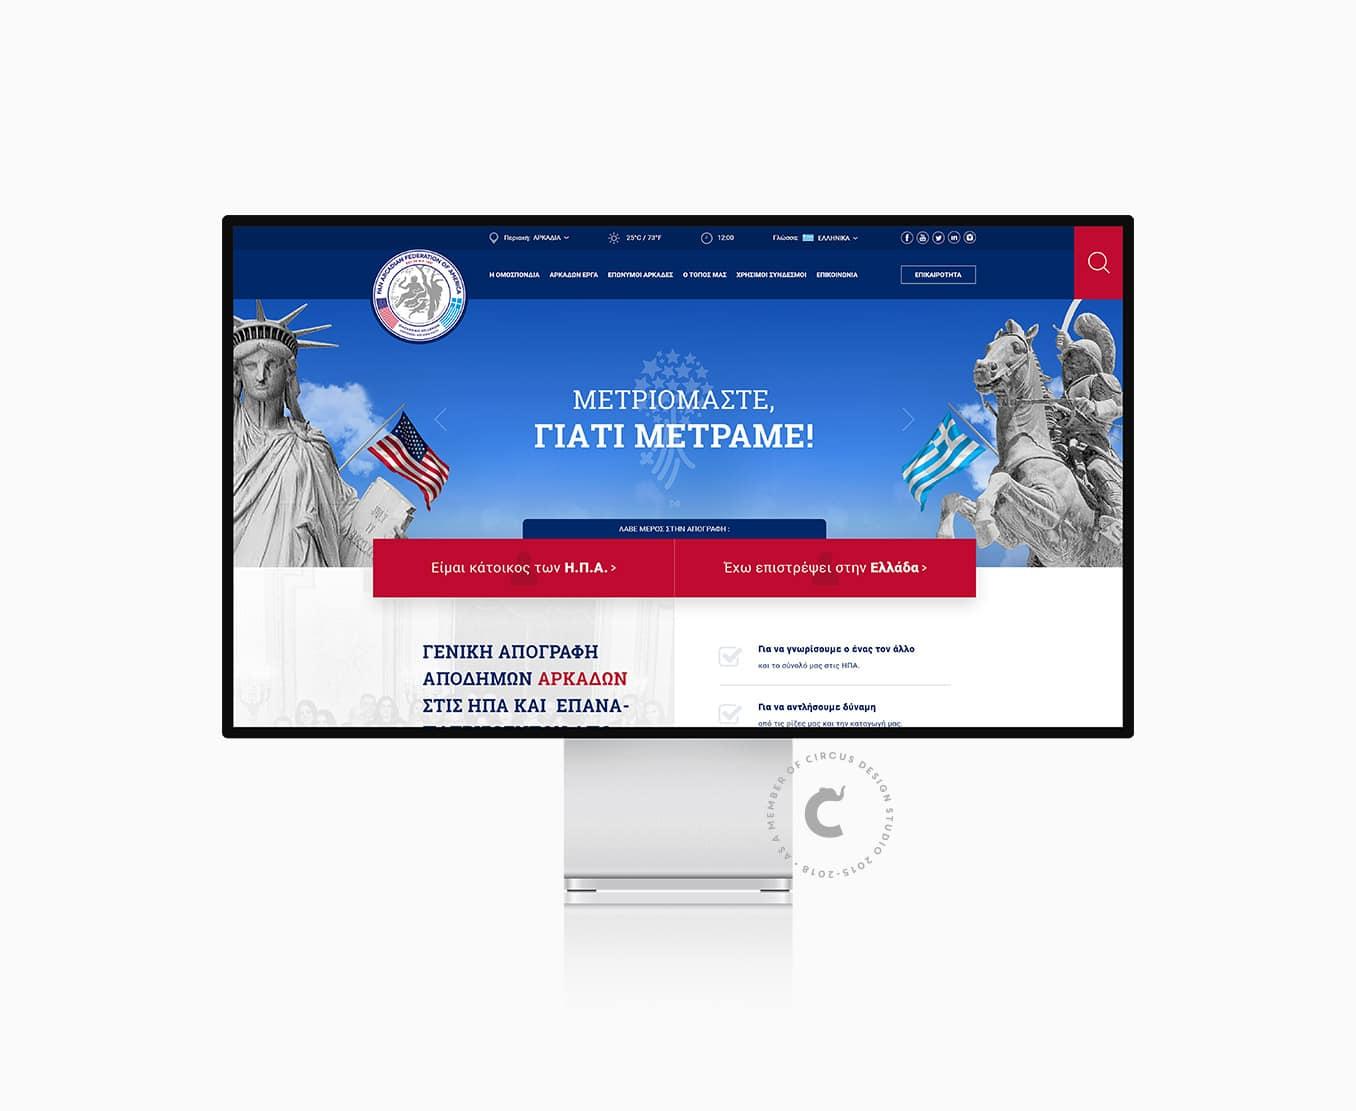 trakaliaroudis website panarcadian federation of america